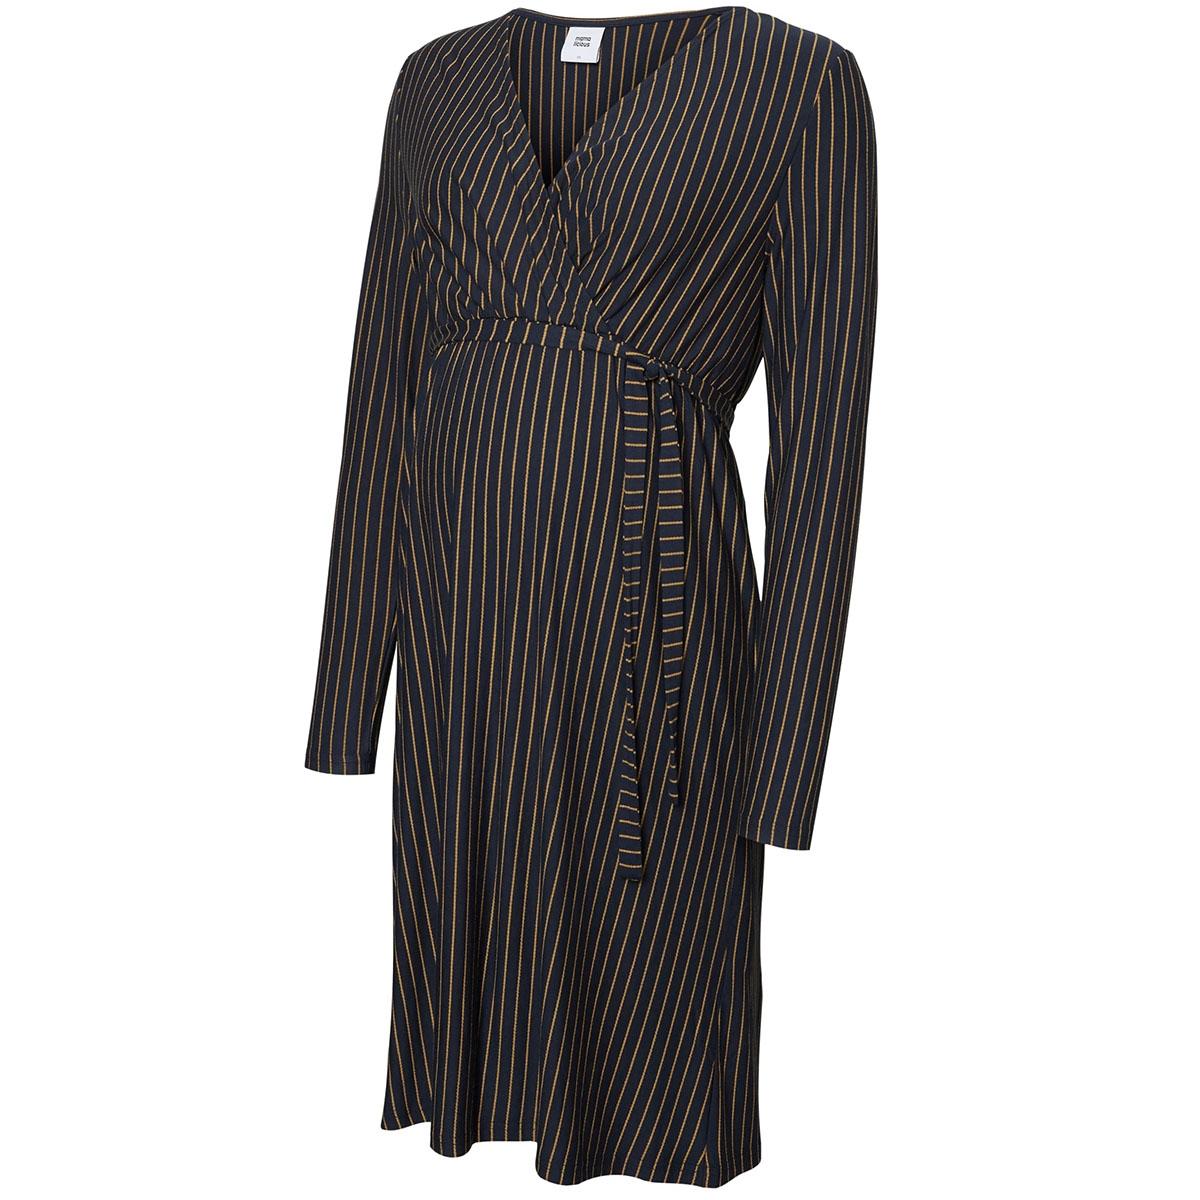 mlbella l/s jersey abk dress 20010631 mama-licious positie jurk salute/tobacco br